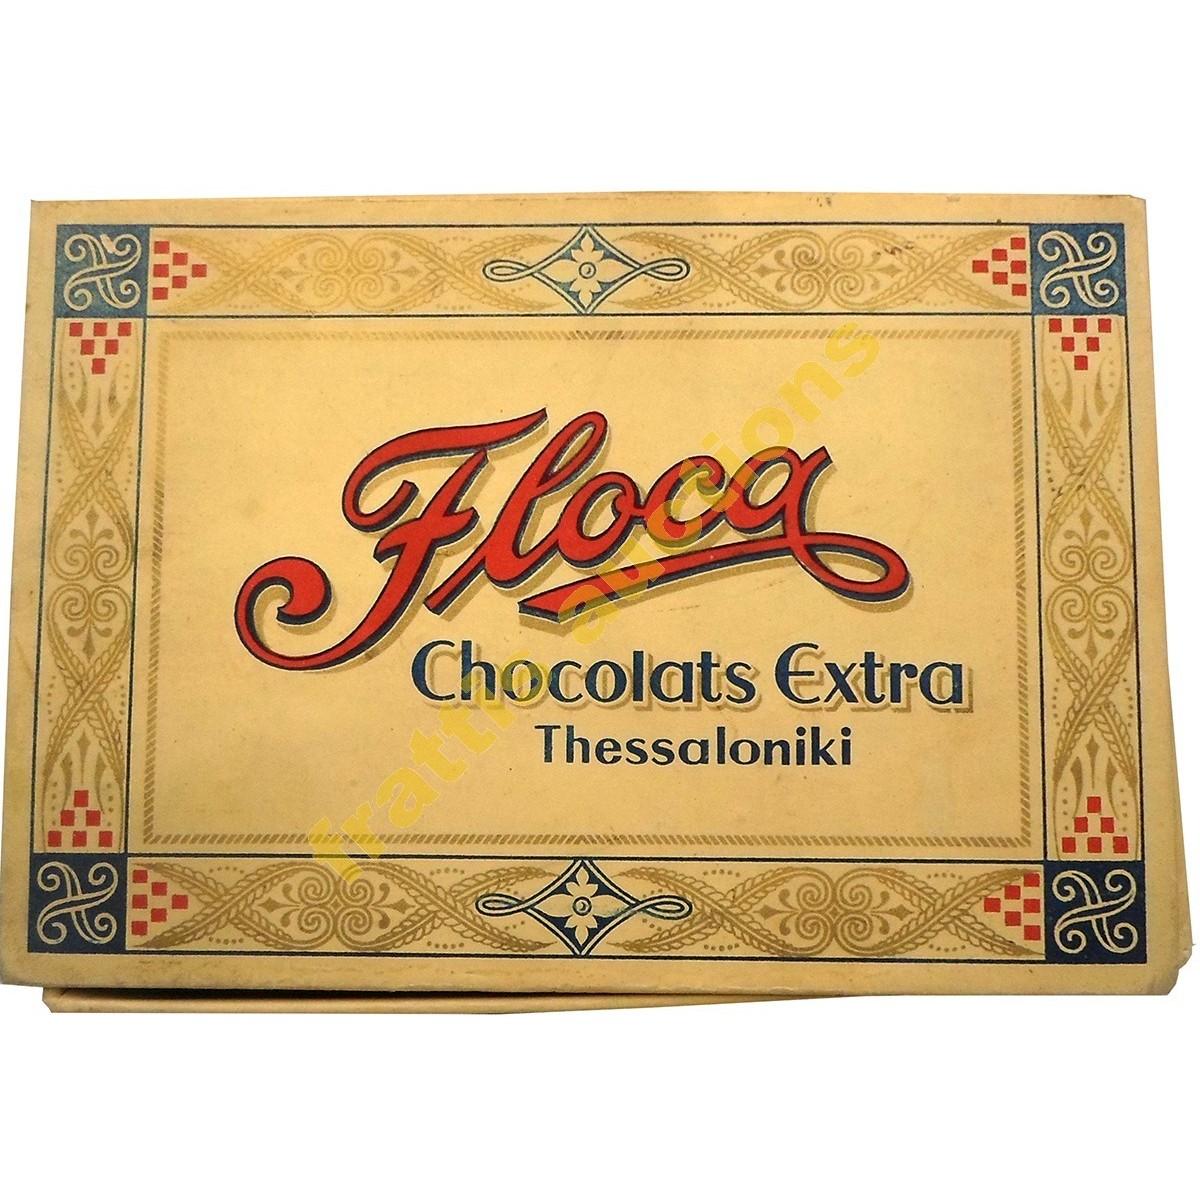 Floca, χάρτινο κουτί.